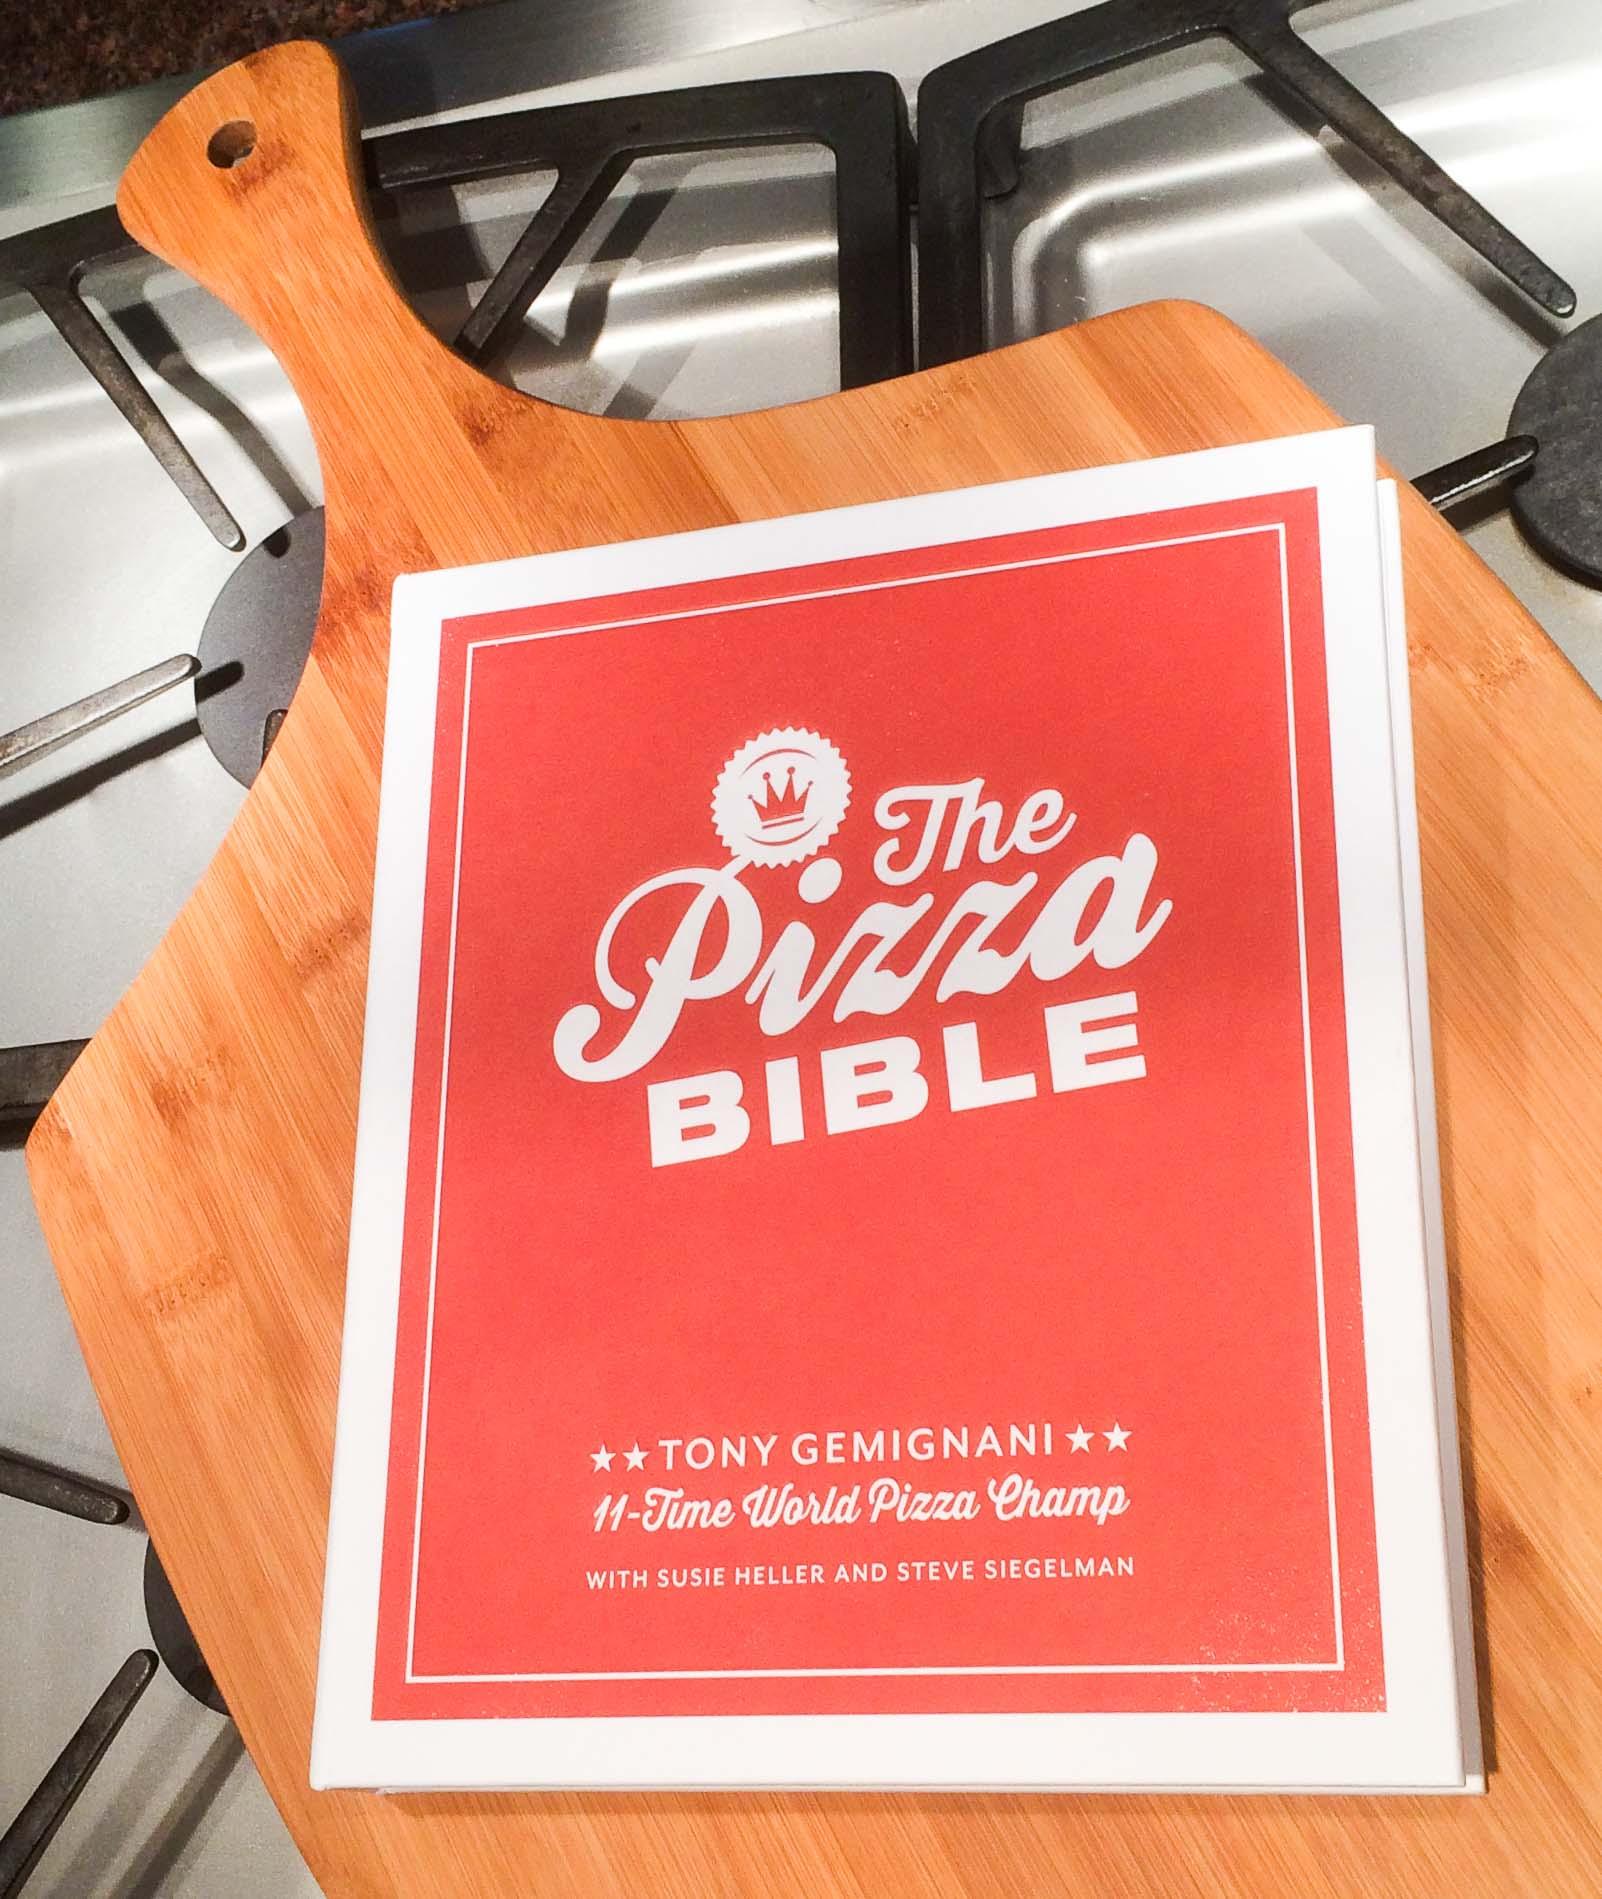 pizzabibble (1 of 1)